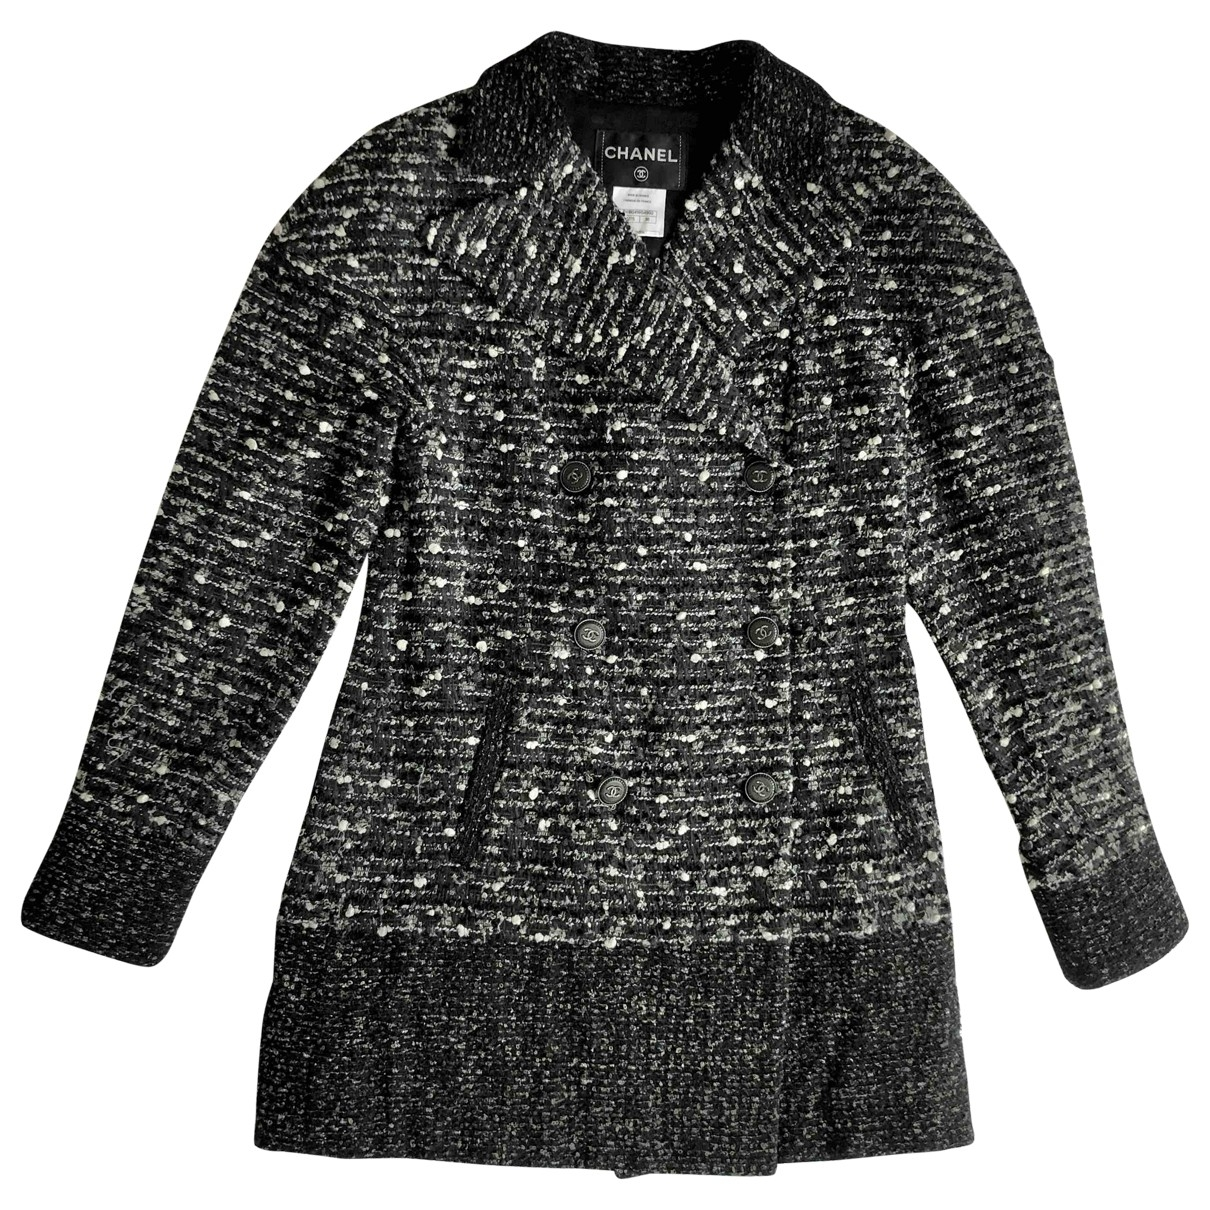 Chanel - Veste   pour femme en tweed - anthracite